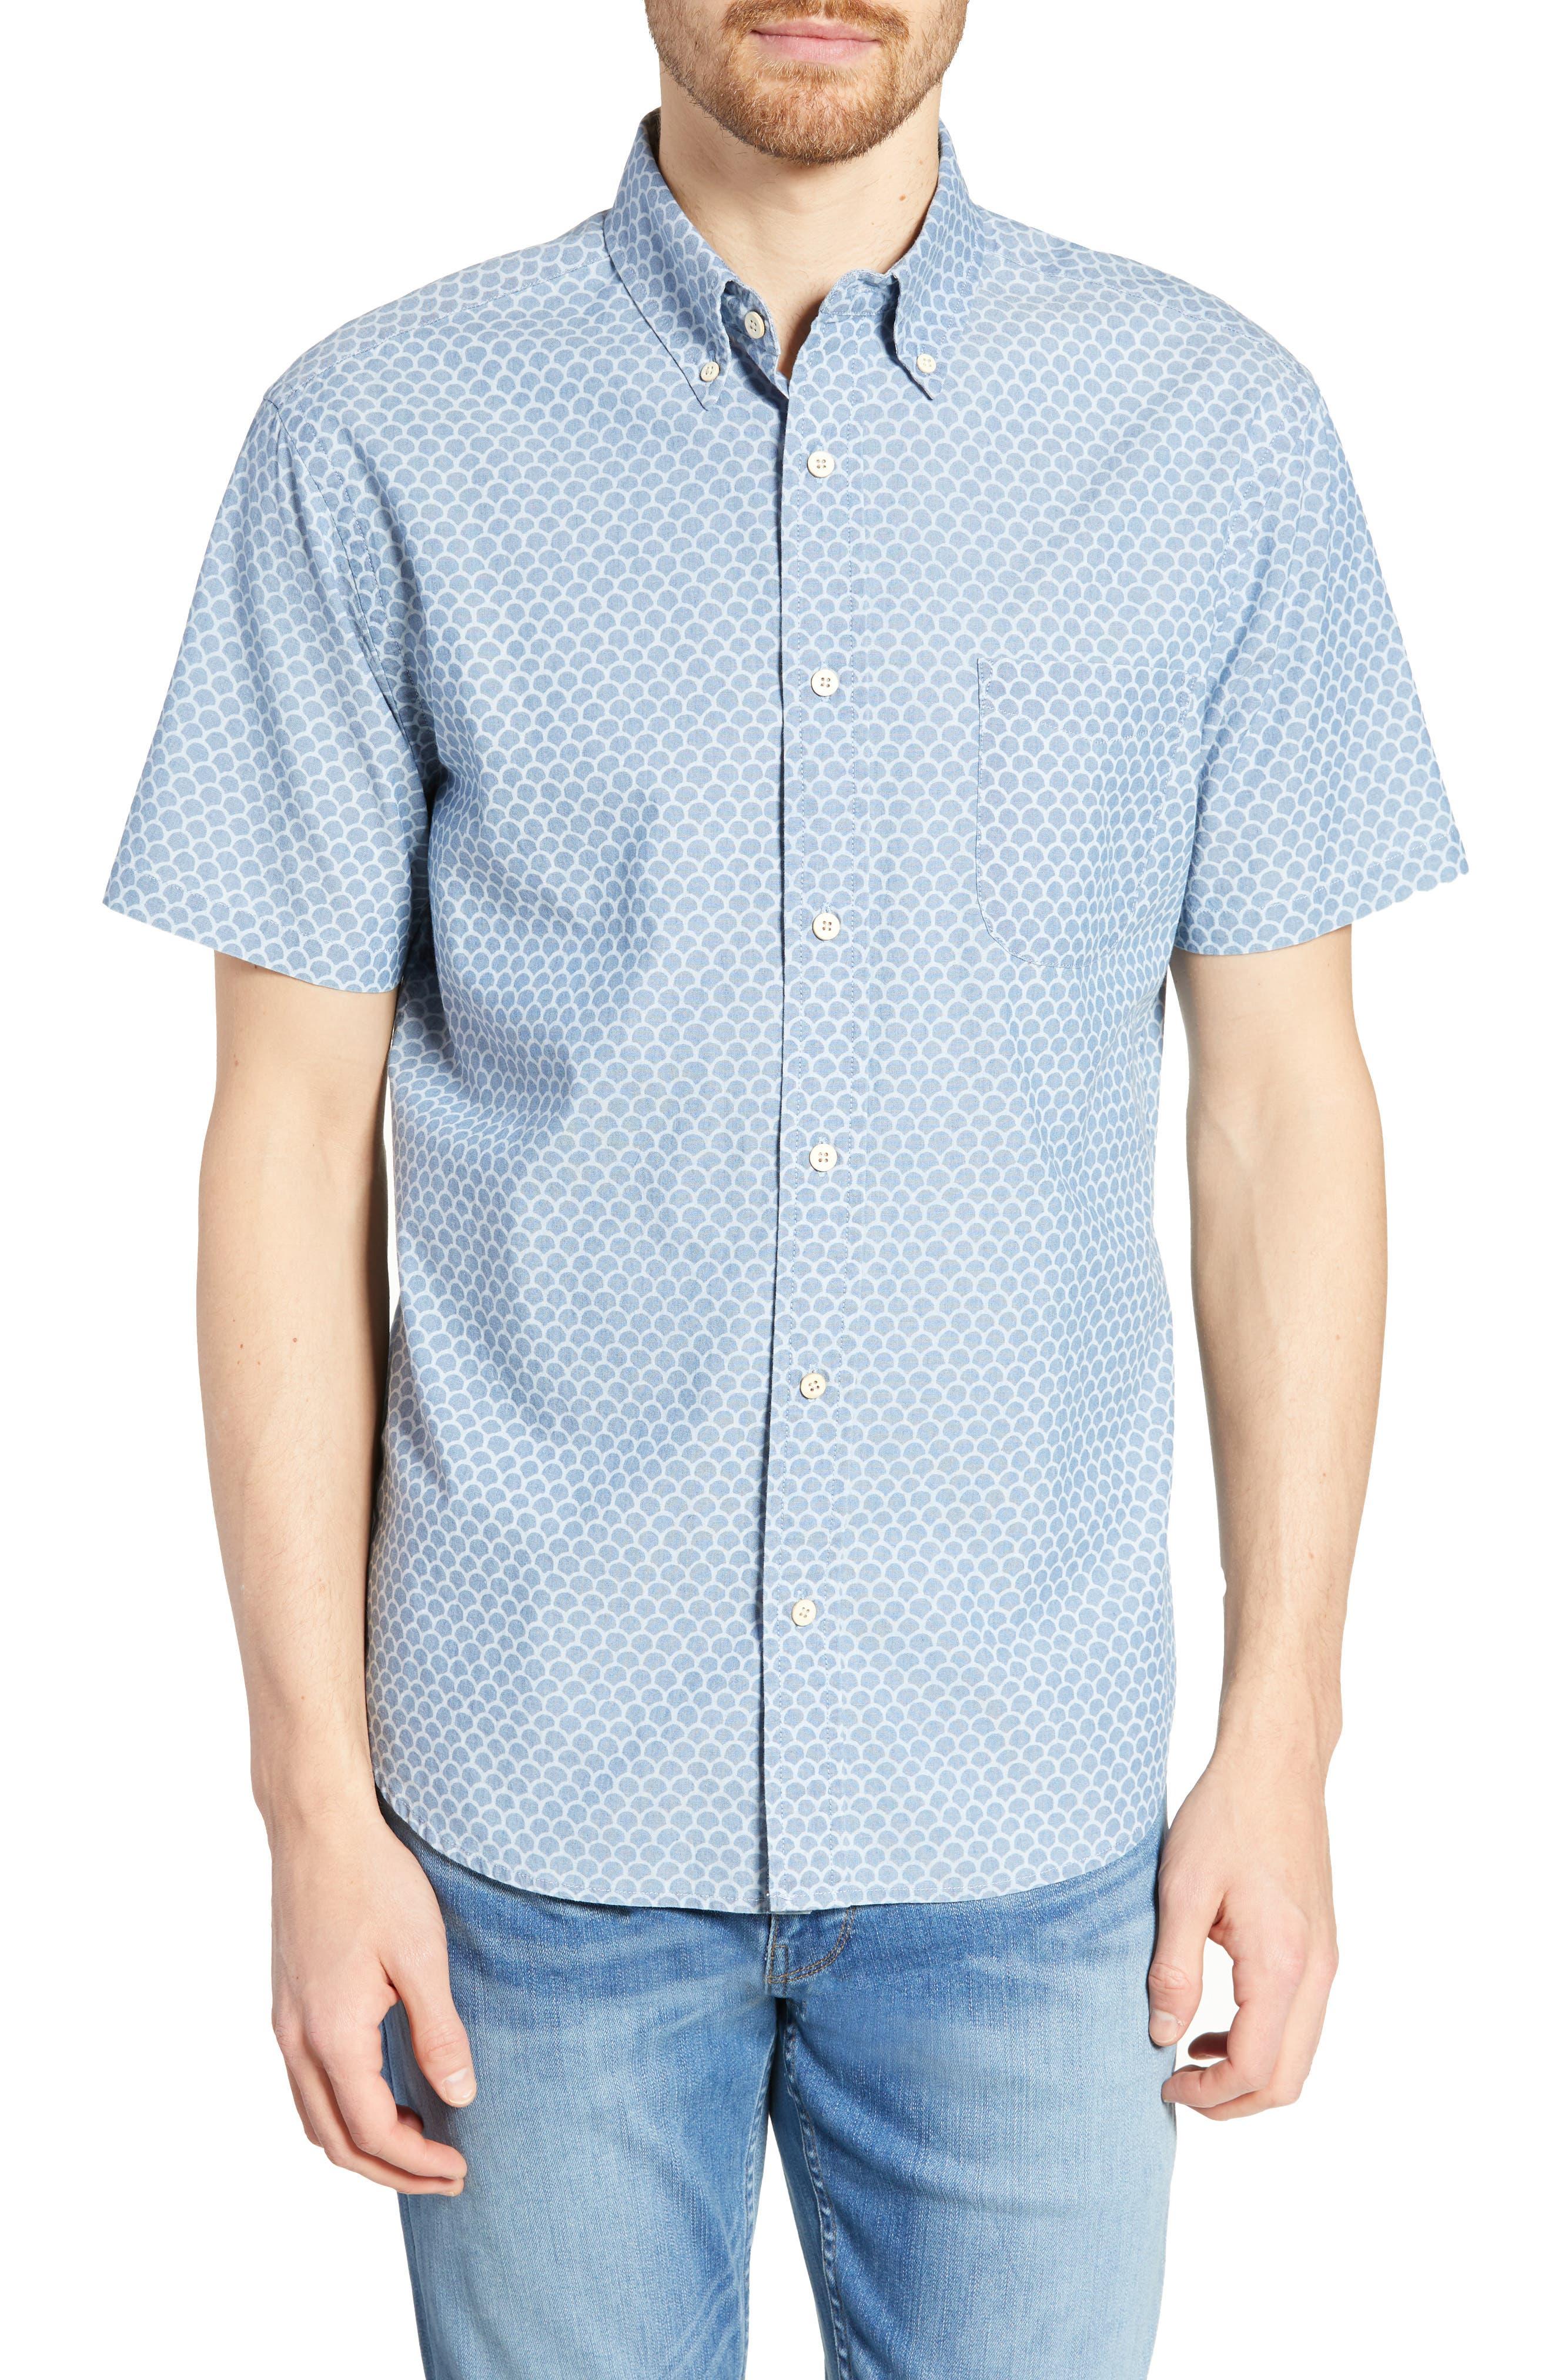 Faherty Pacific Regular Fit Fishscale Print Cotton Sport Shirt, Blue